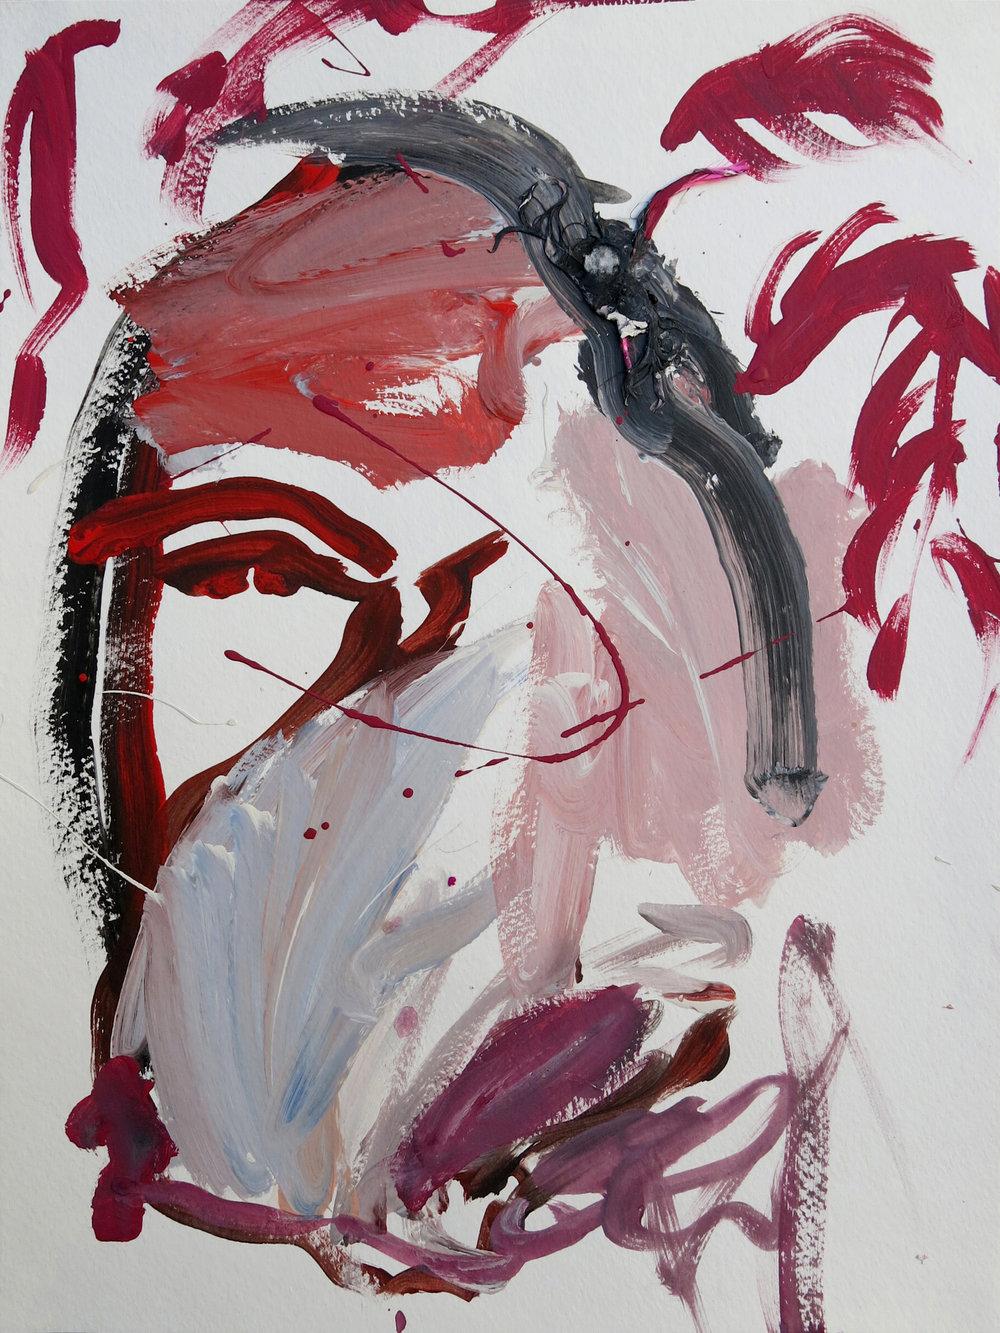 Barbra Streisand Portrait #216